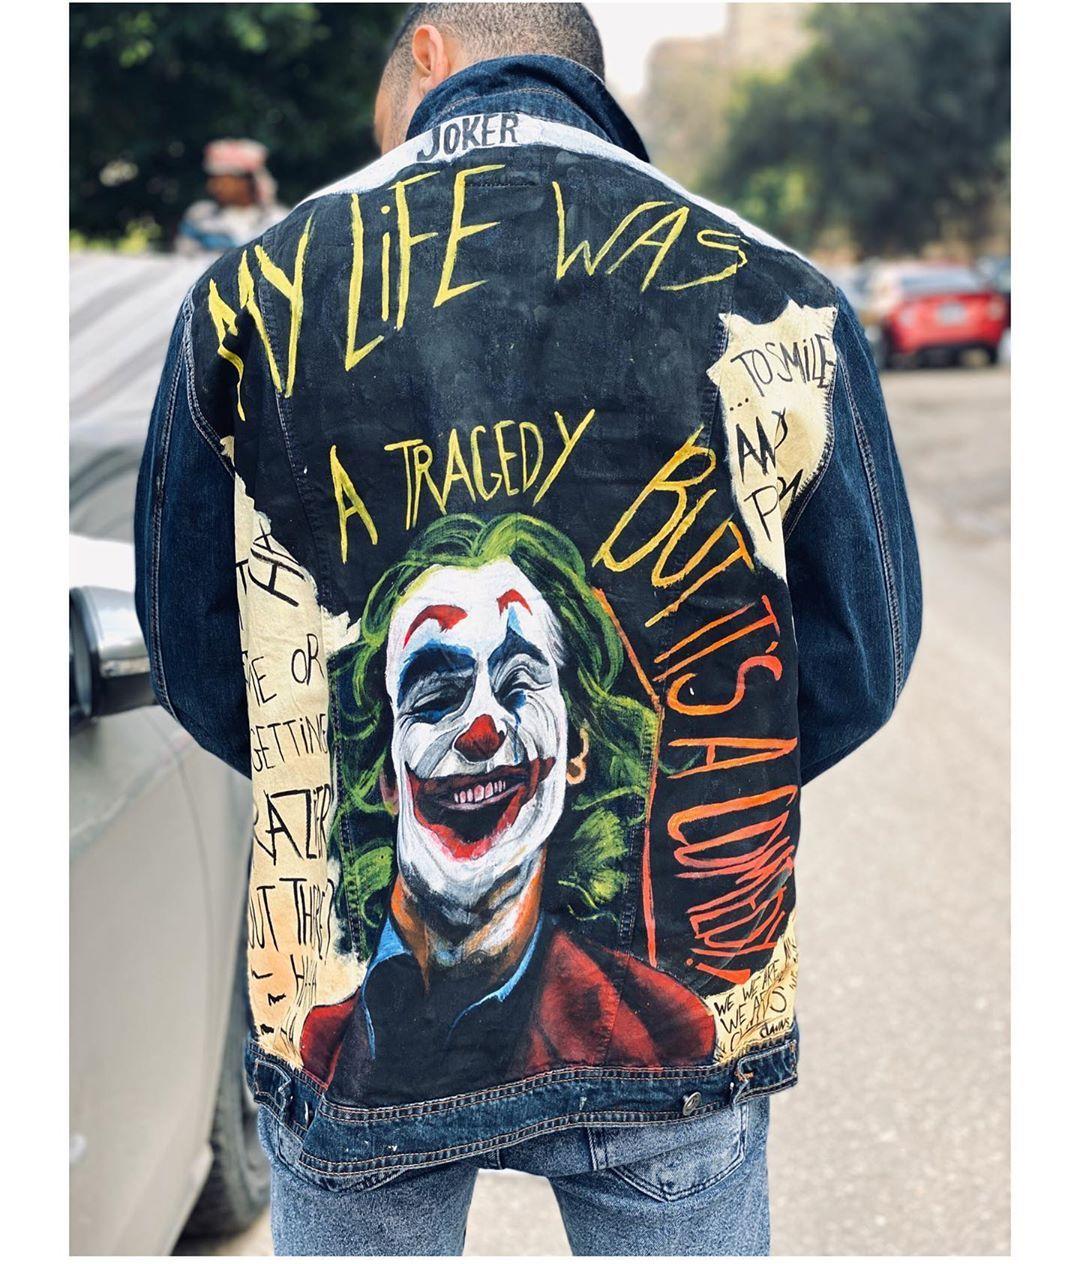 Get For Free The Joker Phone Case 2019 Jokerquote Jokerquotes Jokermotivation Jokermovie Jokermemes Jokerlover Denim Jacket Men Joker Jacket Joker Outfit [ 1264 x 1080 Pixel ]